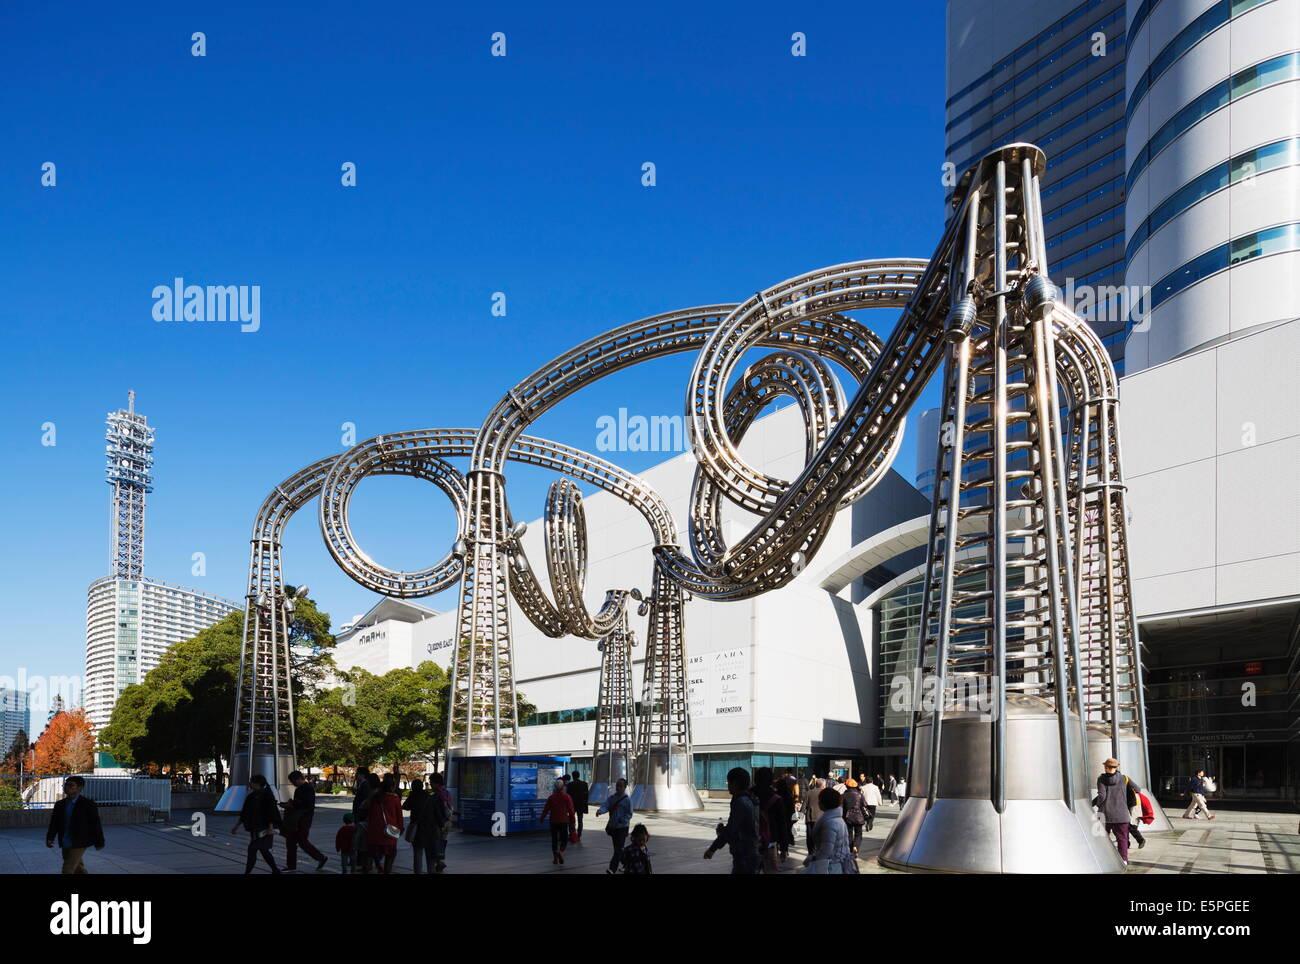 Modern art sculpture in Queen's Square, Yokohama, Honshu, Japan, Asia - Stock Image